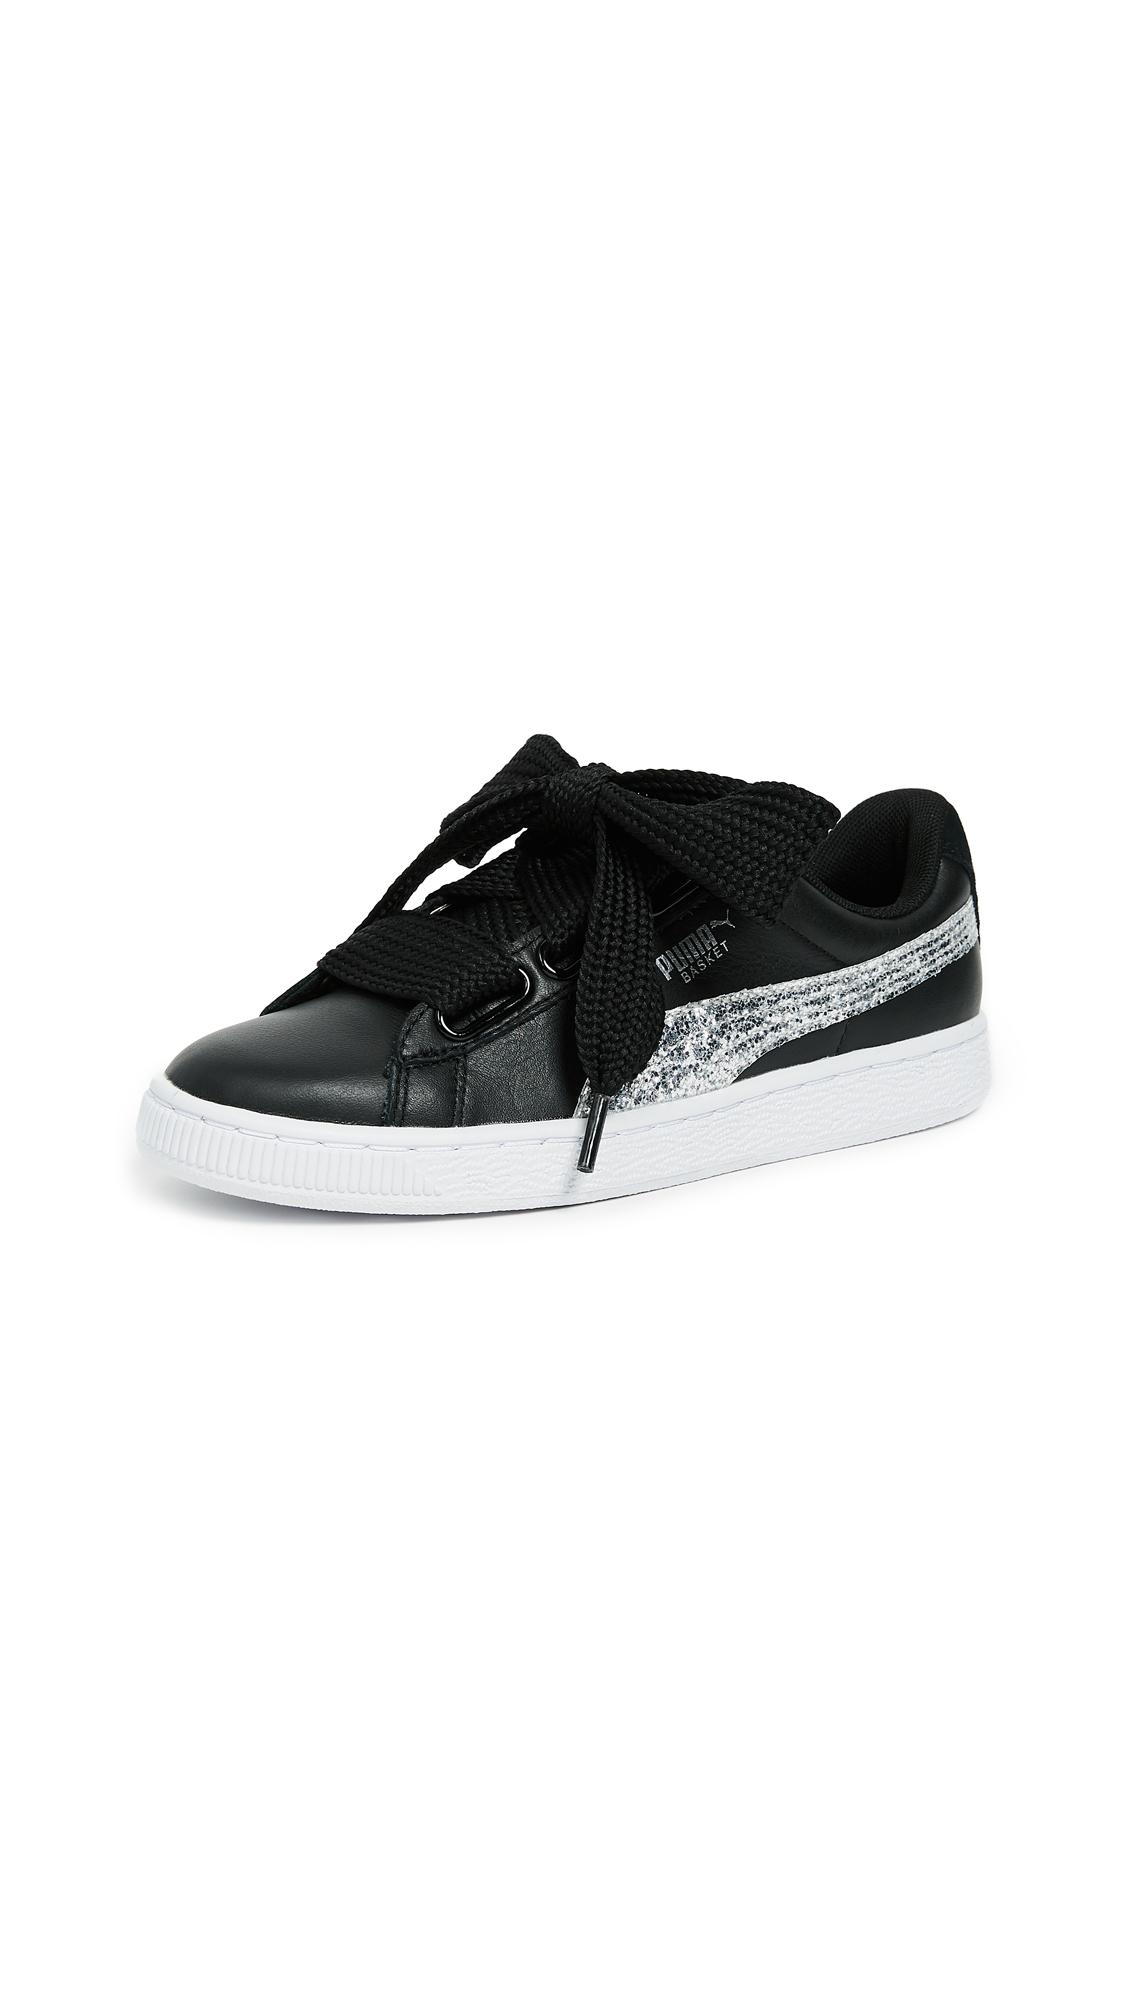 PUMA Basket Heart Glitter Sneakers - Puma Black/Silver